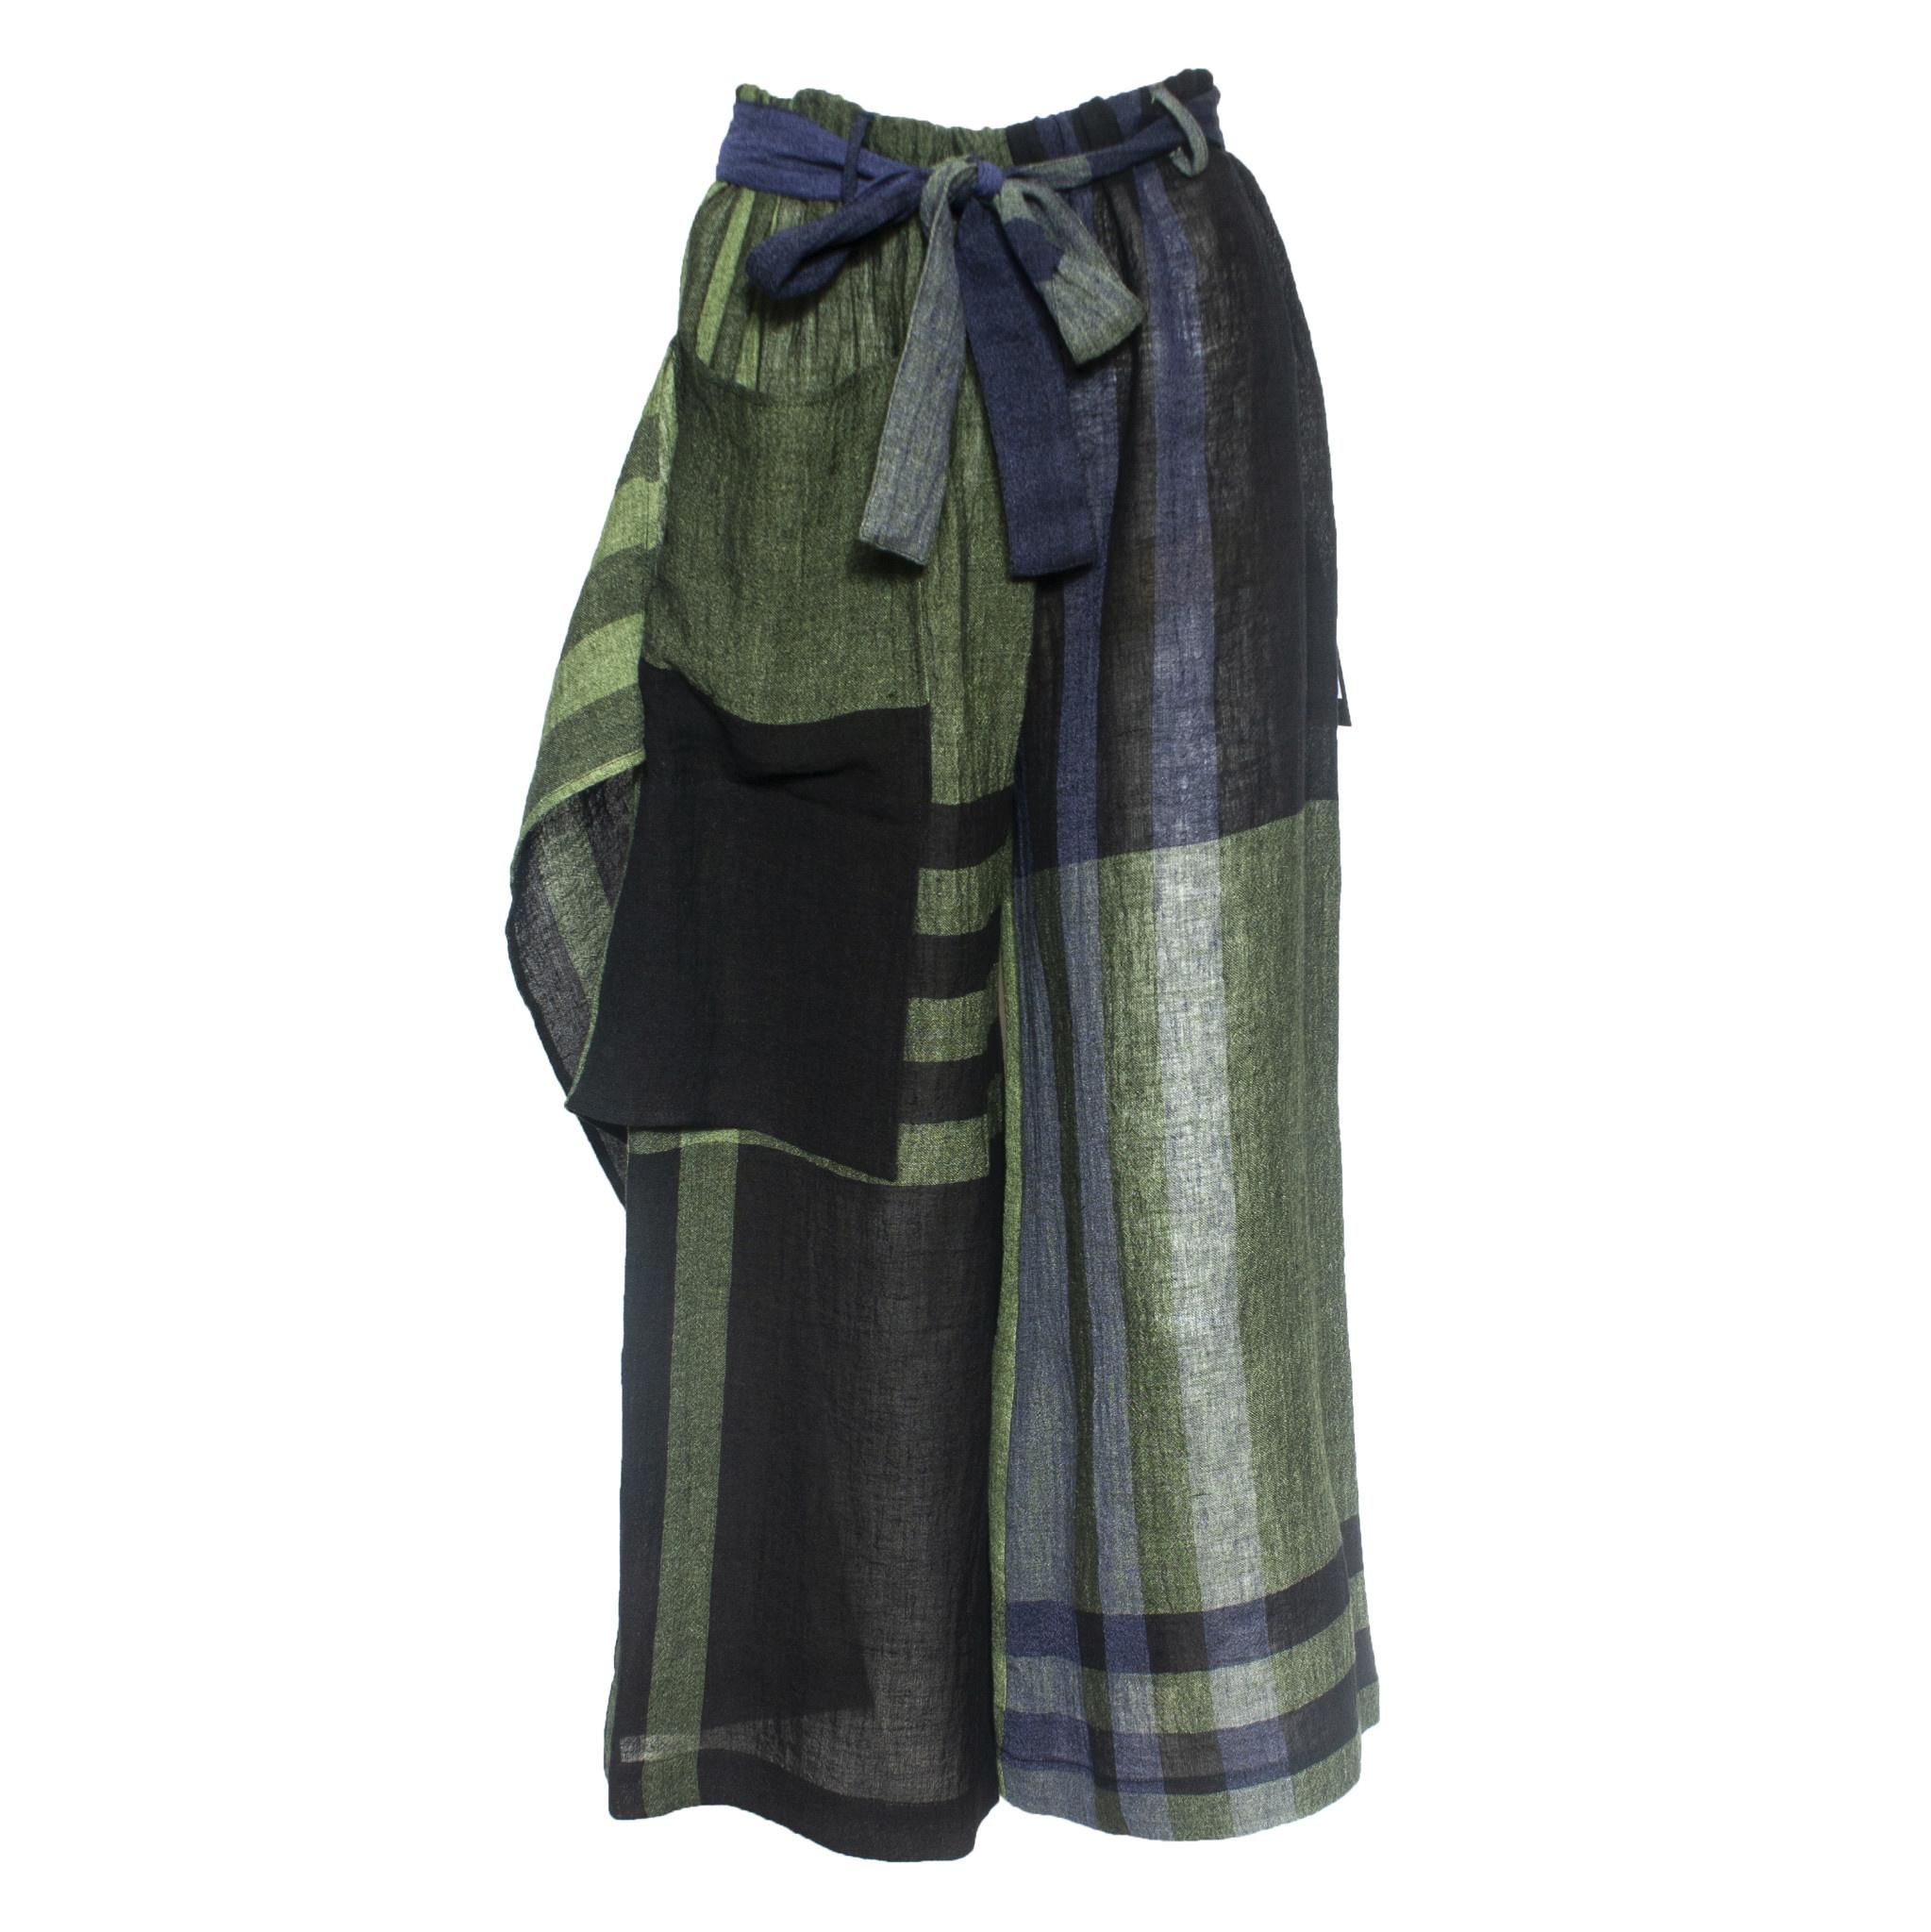 Kedziorek Kedziorek Block Plaid Pocket Pants - Green/Navy